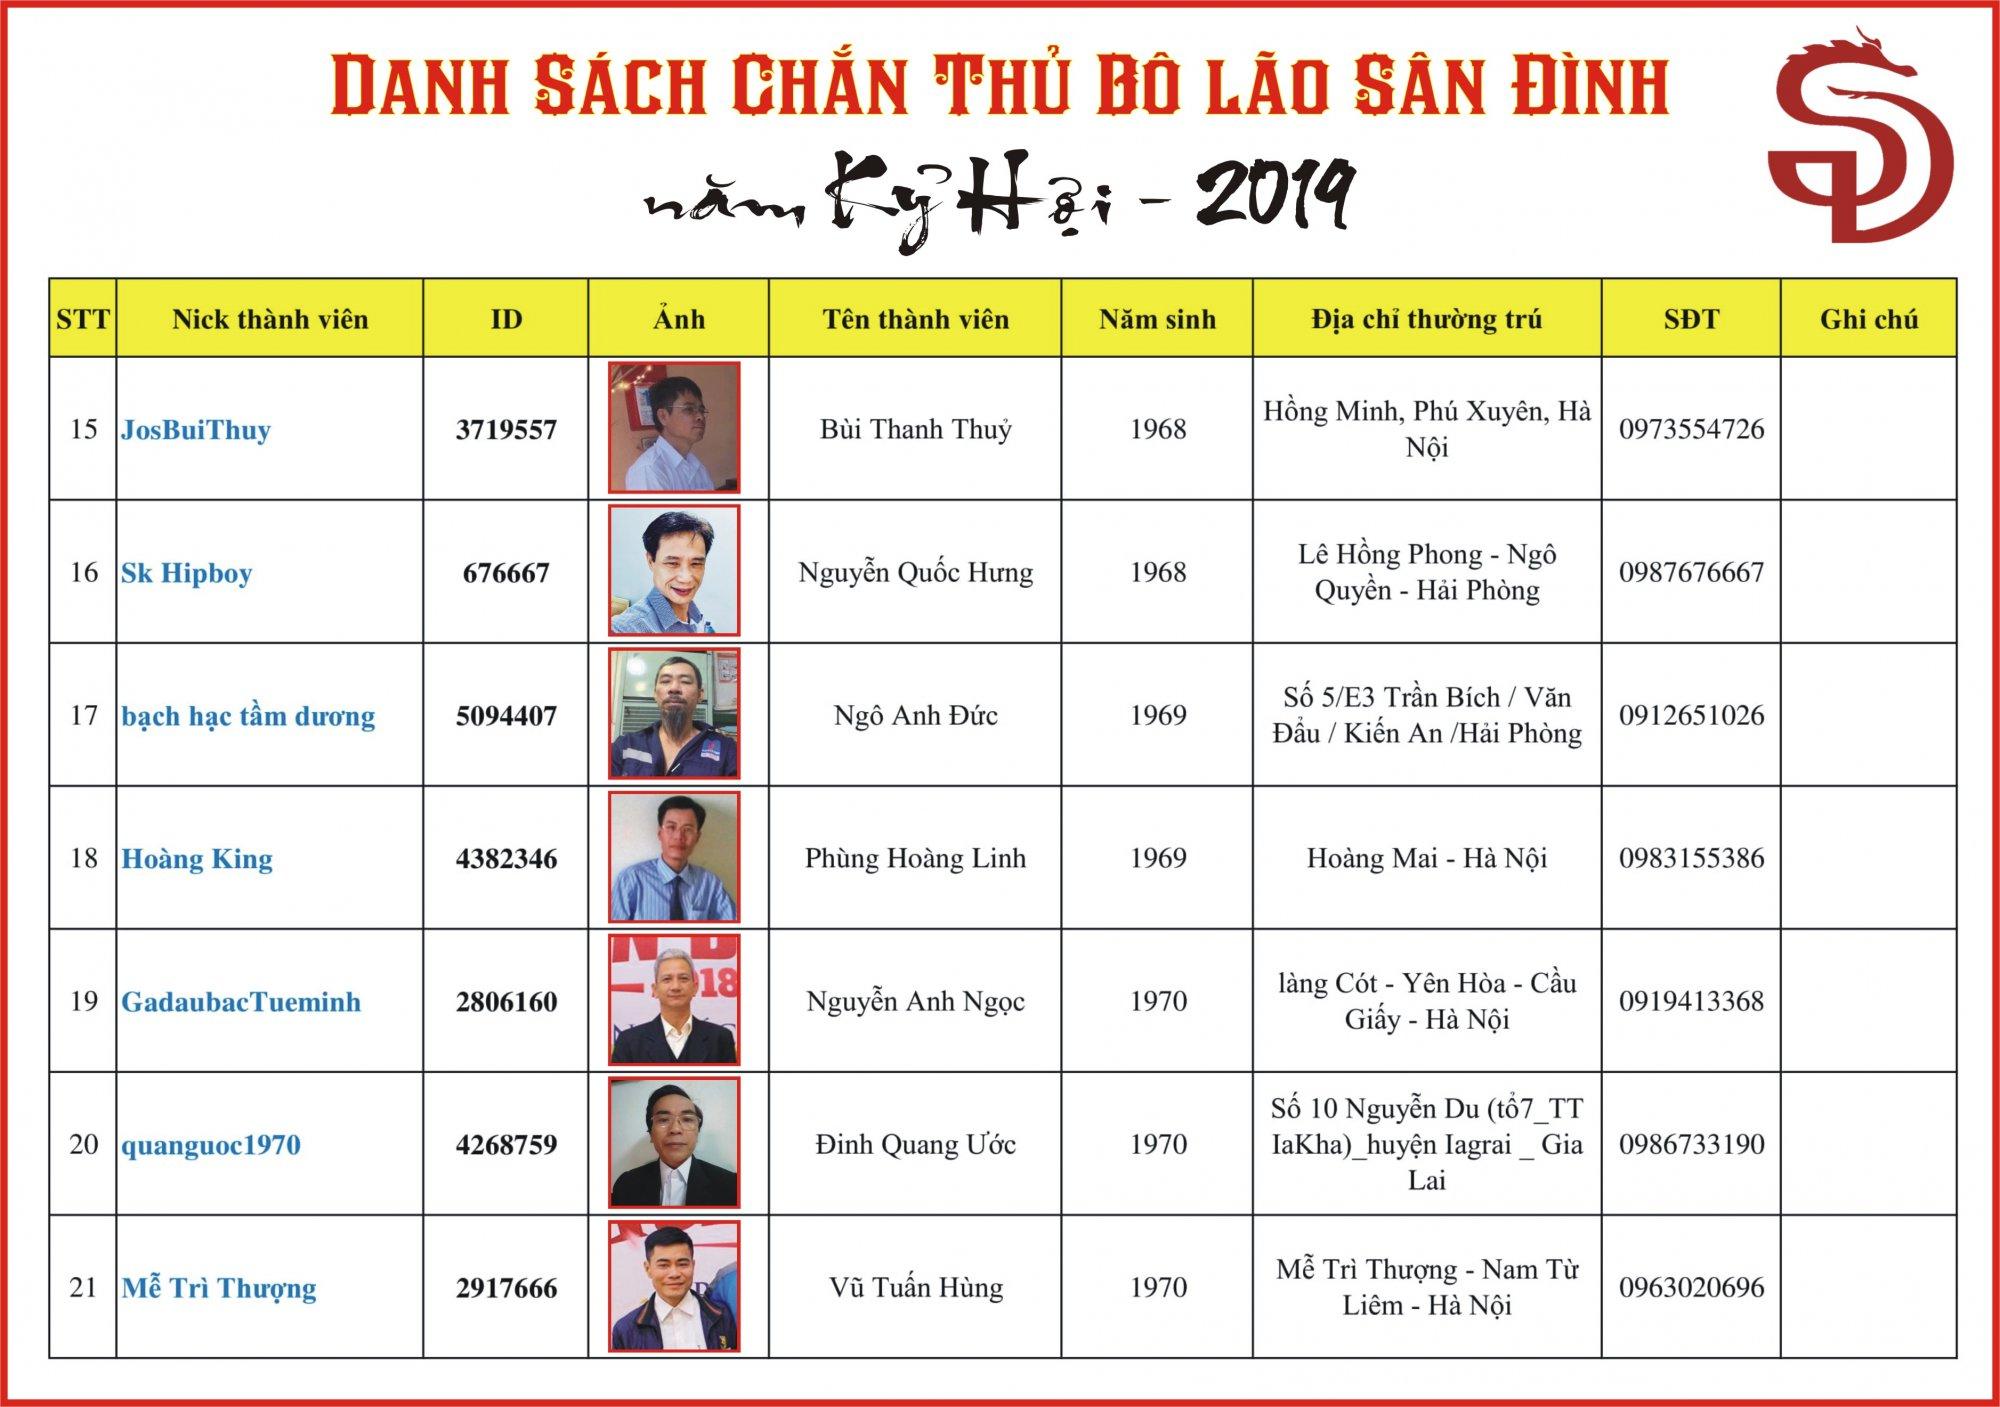 DS Bo lao SD 2019 (3-1).JPG